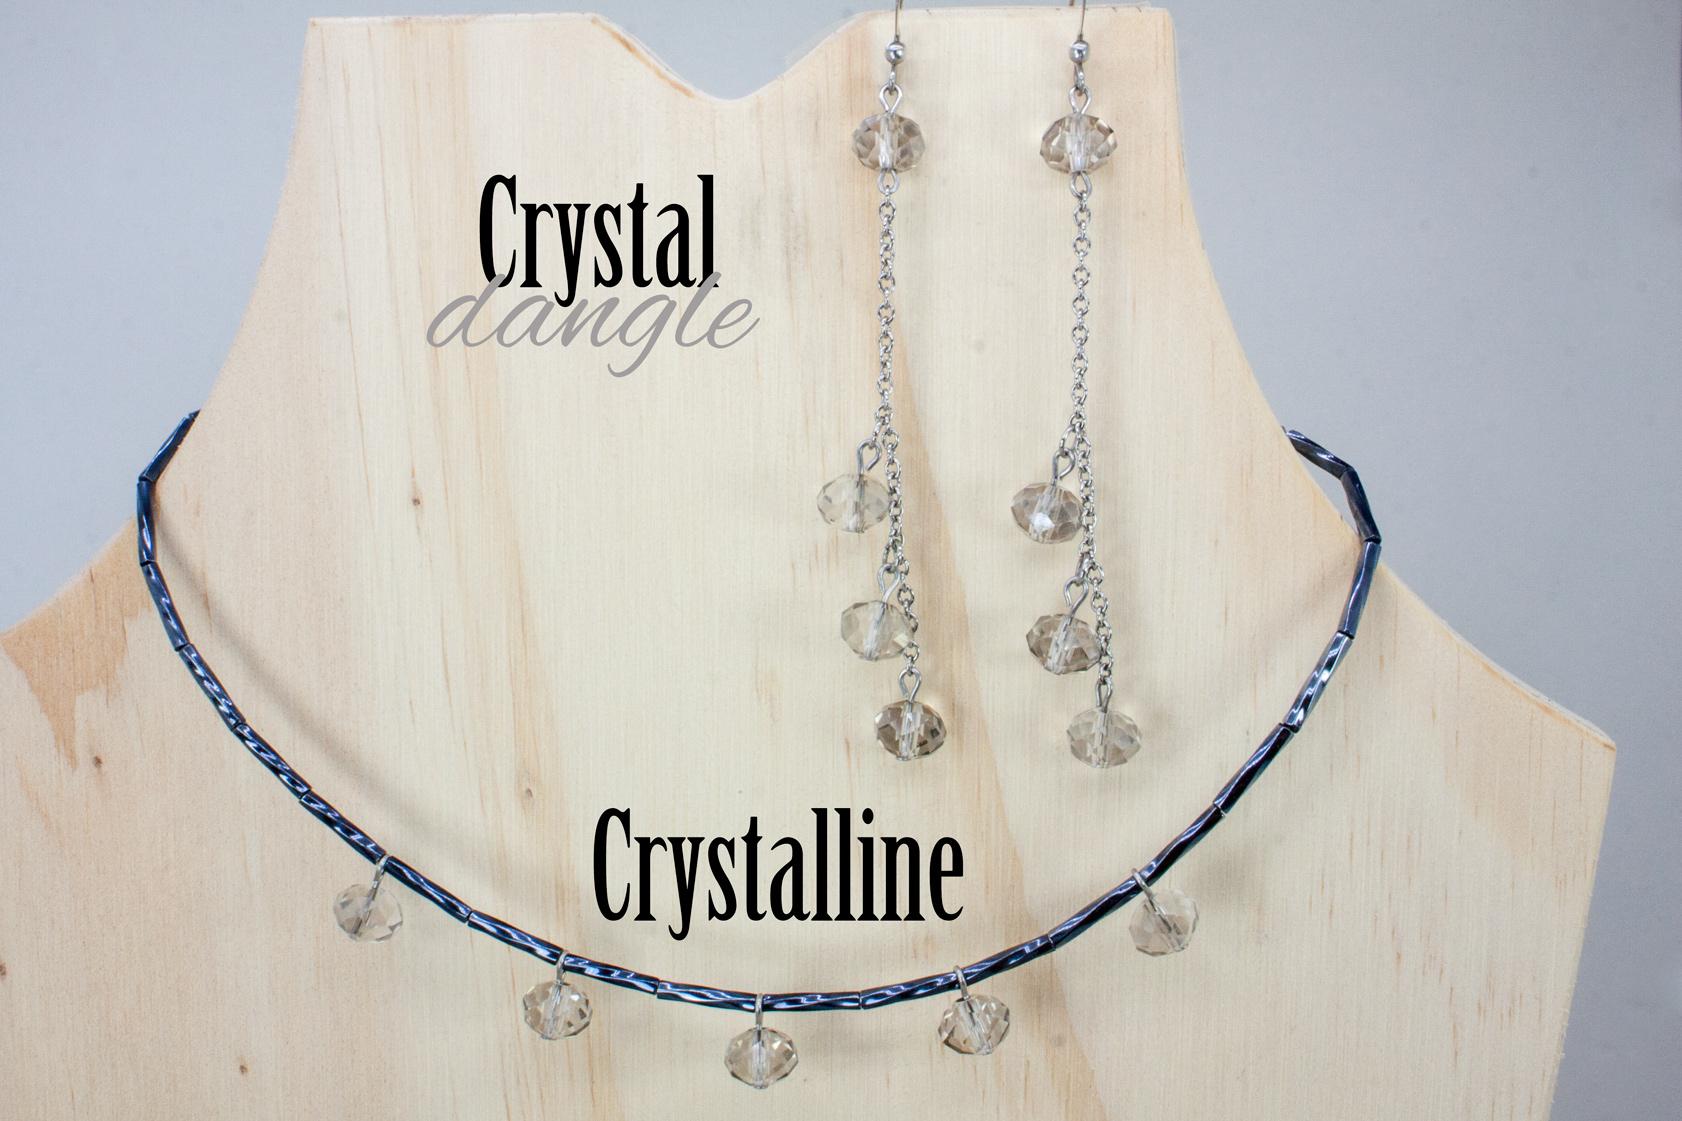 crystaldanglecrystallinemain.jpg